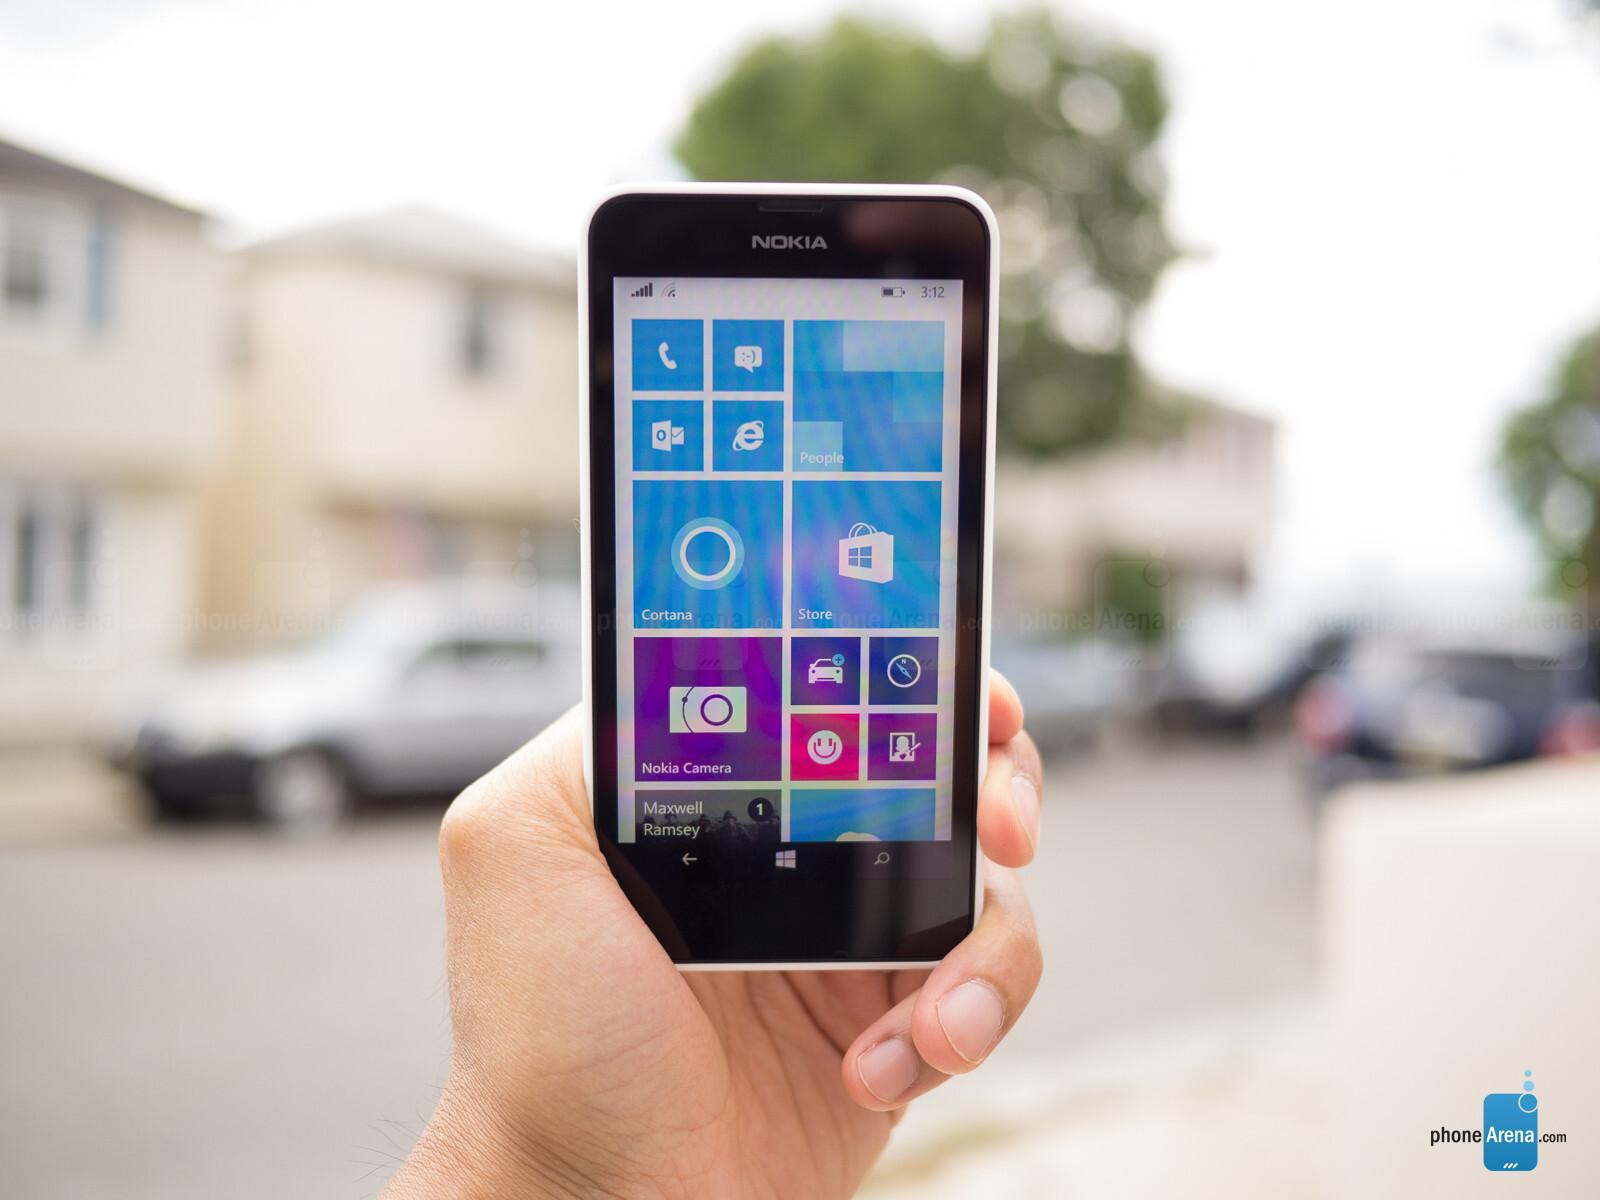 Nokia Lumia 635: reviews. Nokia Lumia 635 smartphone: specifications, price